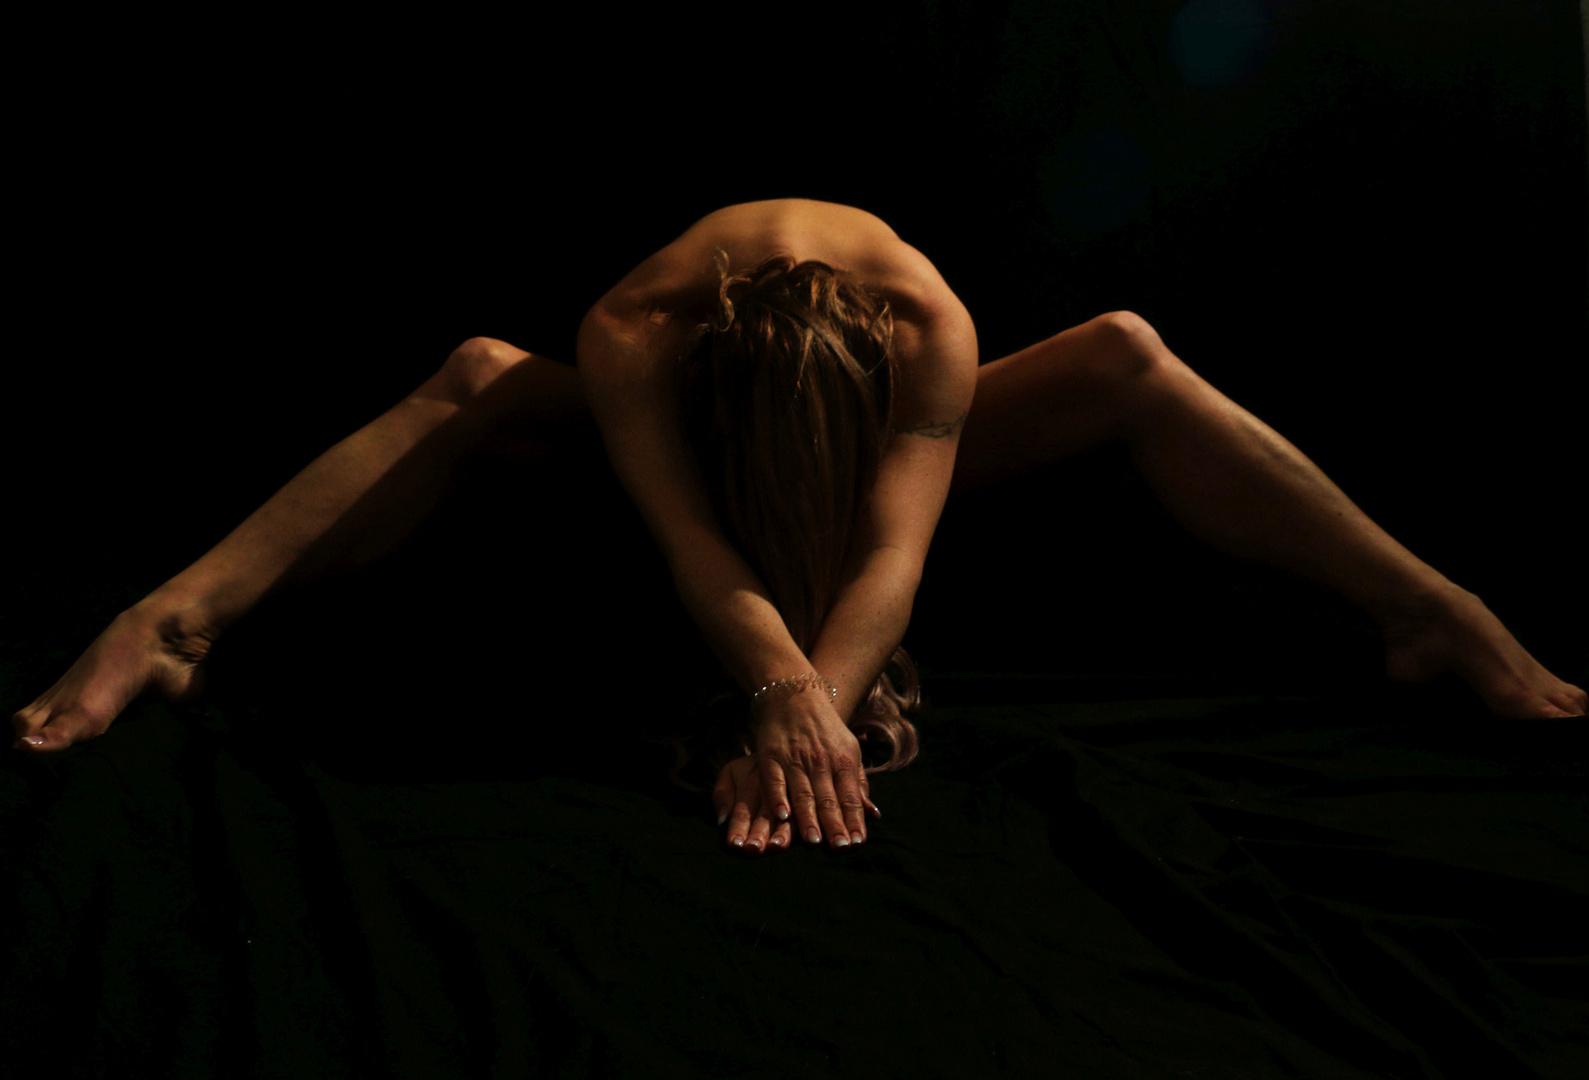 Engel erotik Erotik film